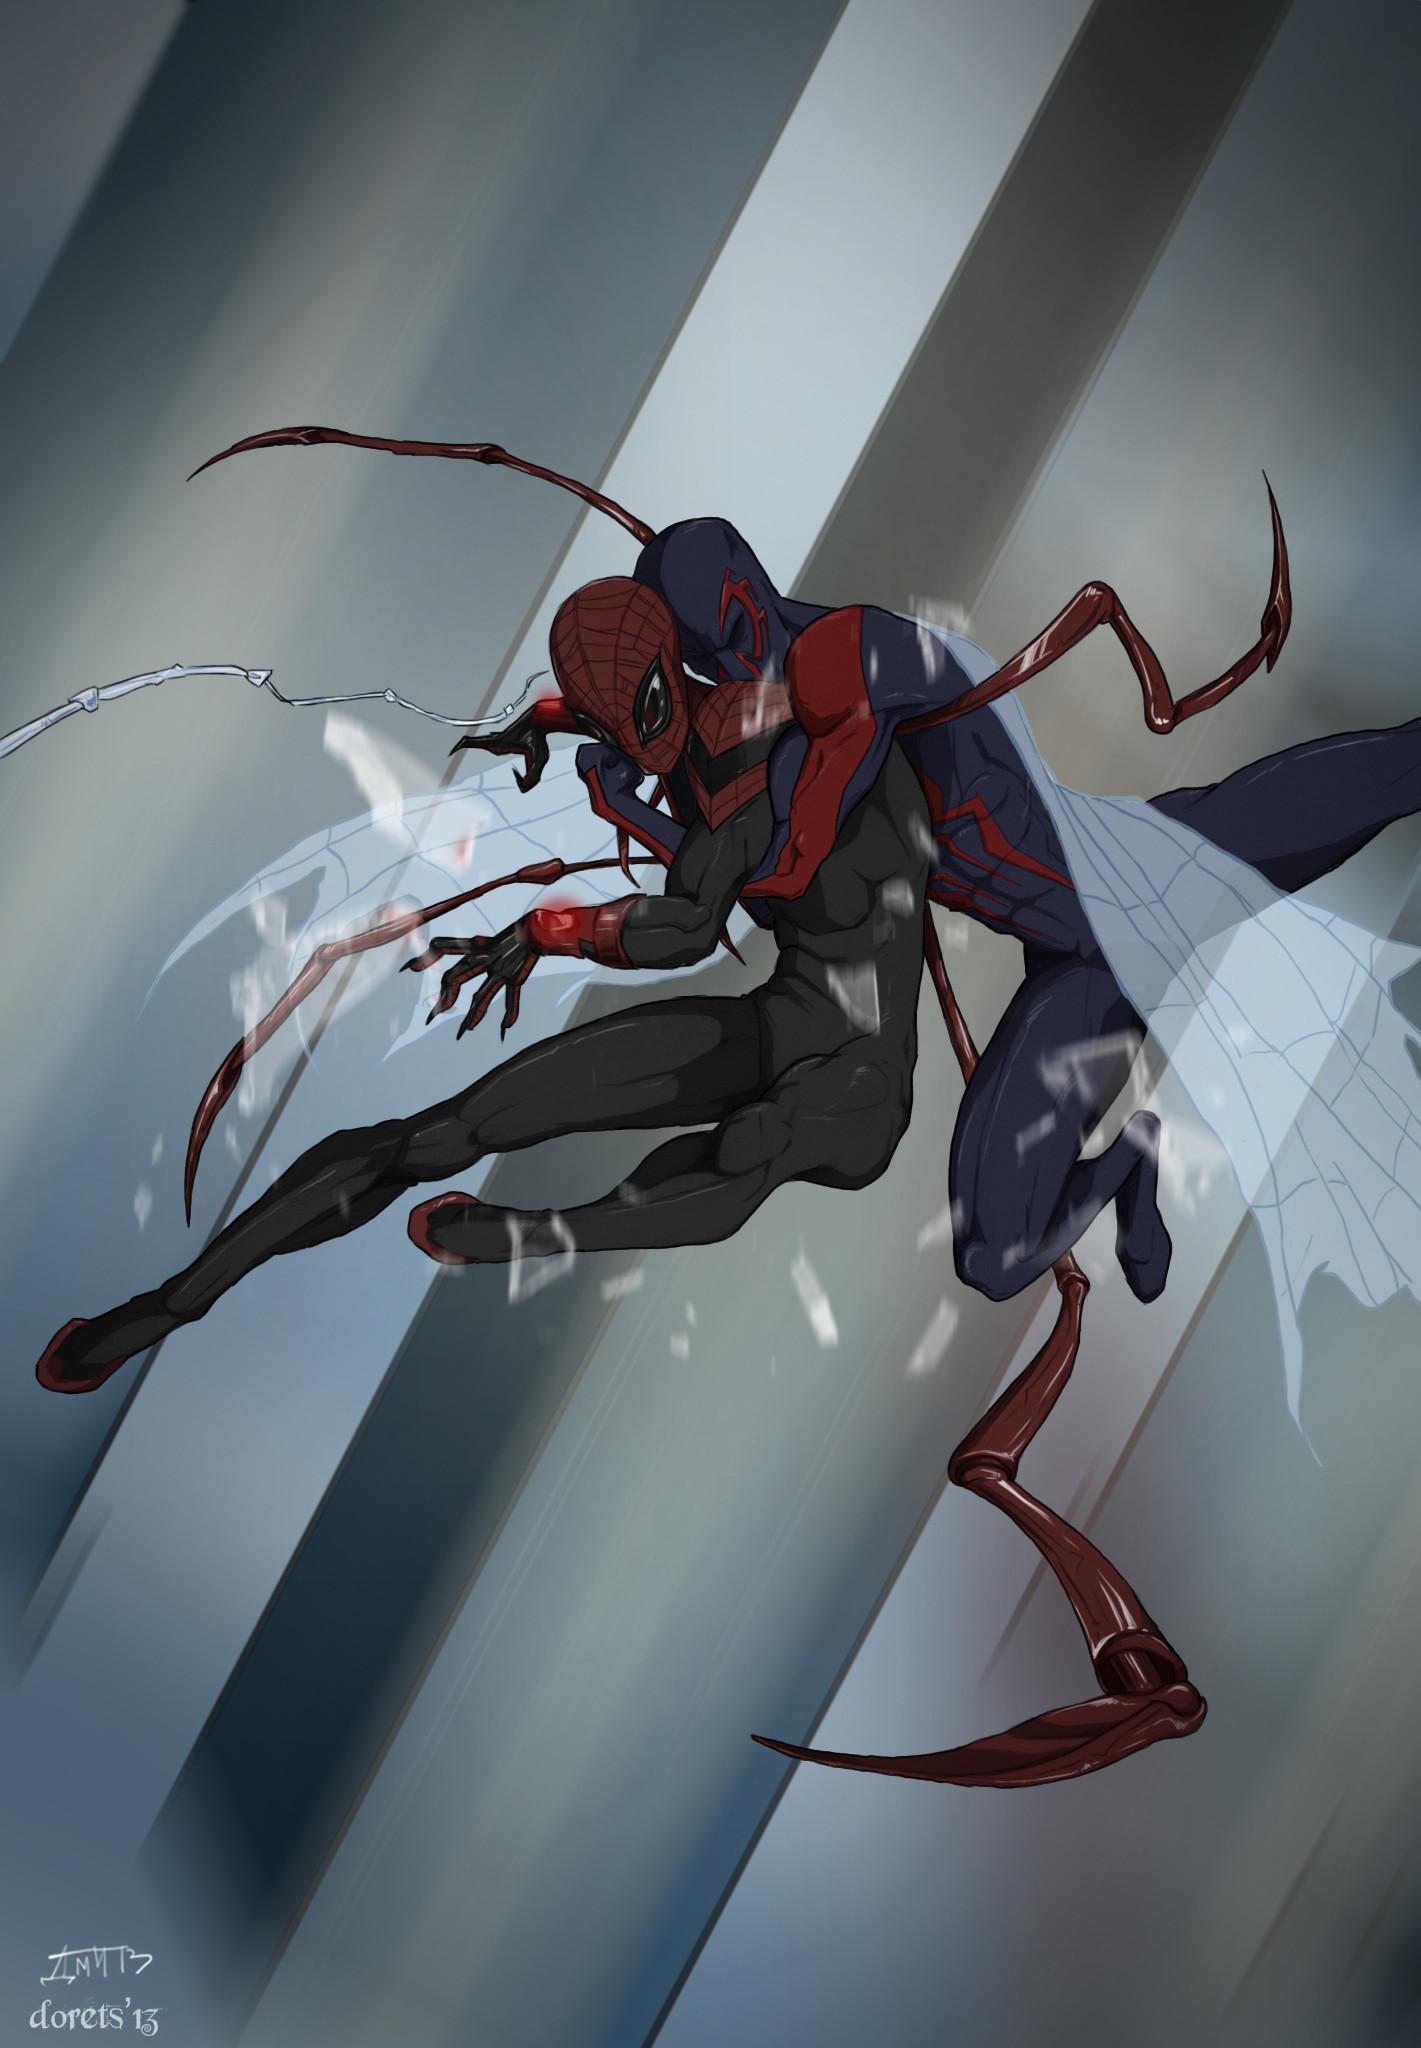 … Superior Spider-Man VS Spider-Man 2099 by deu-O